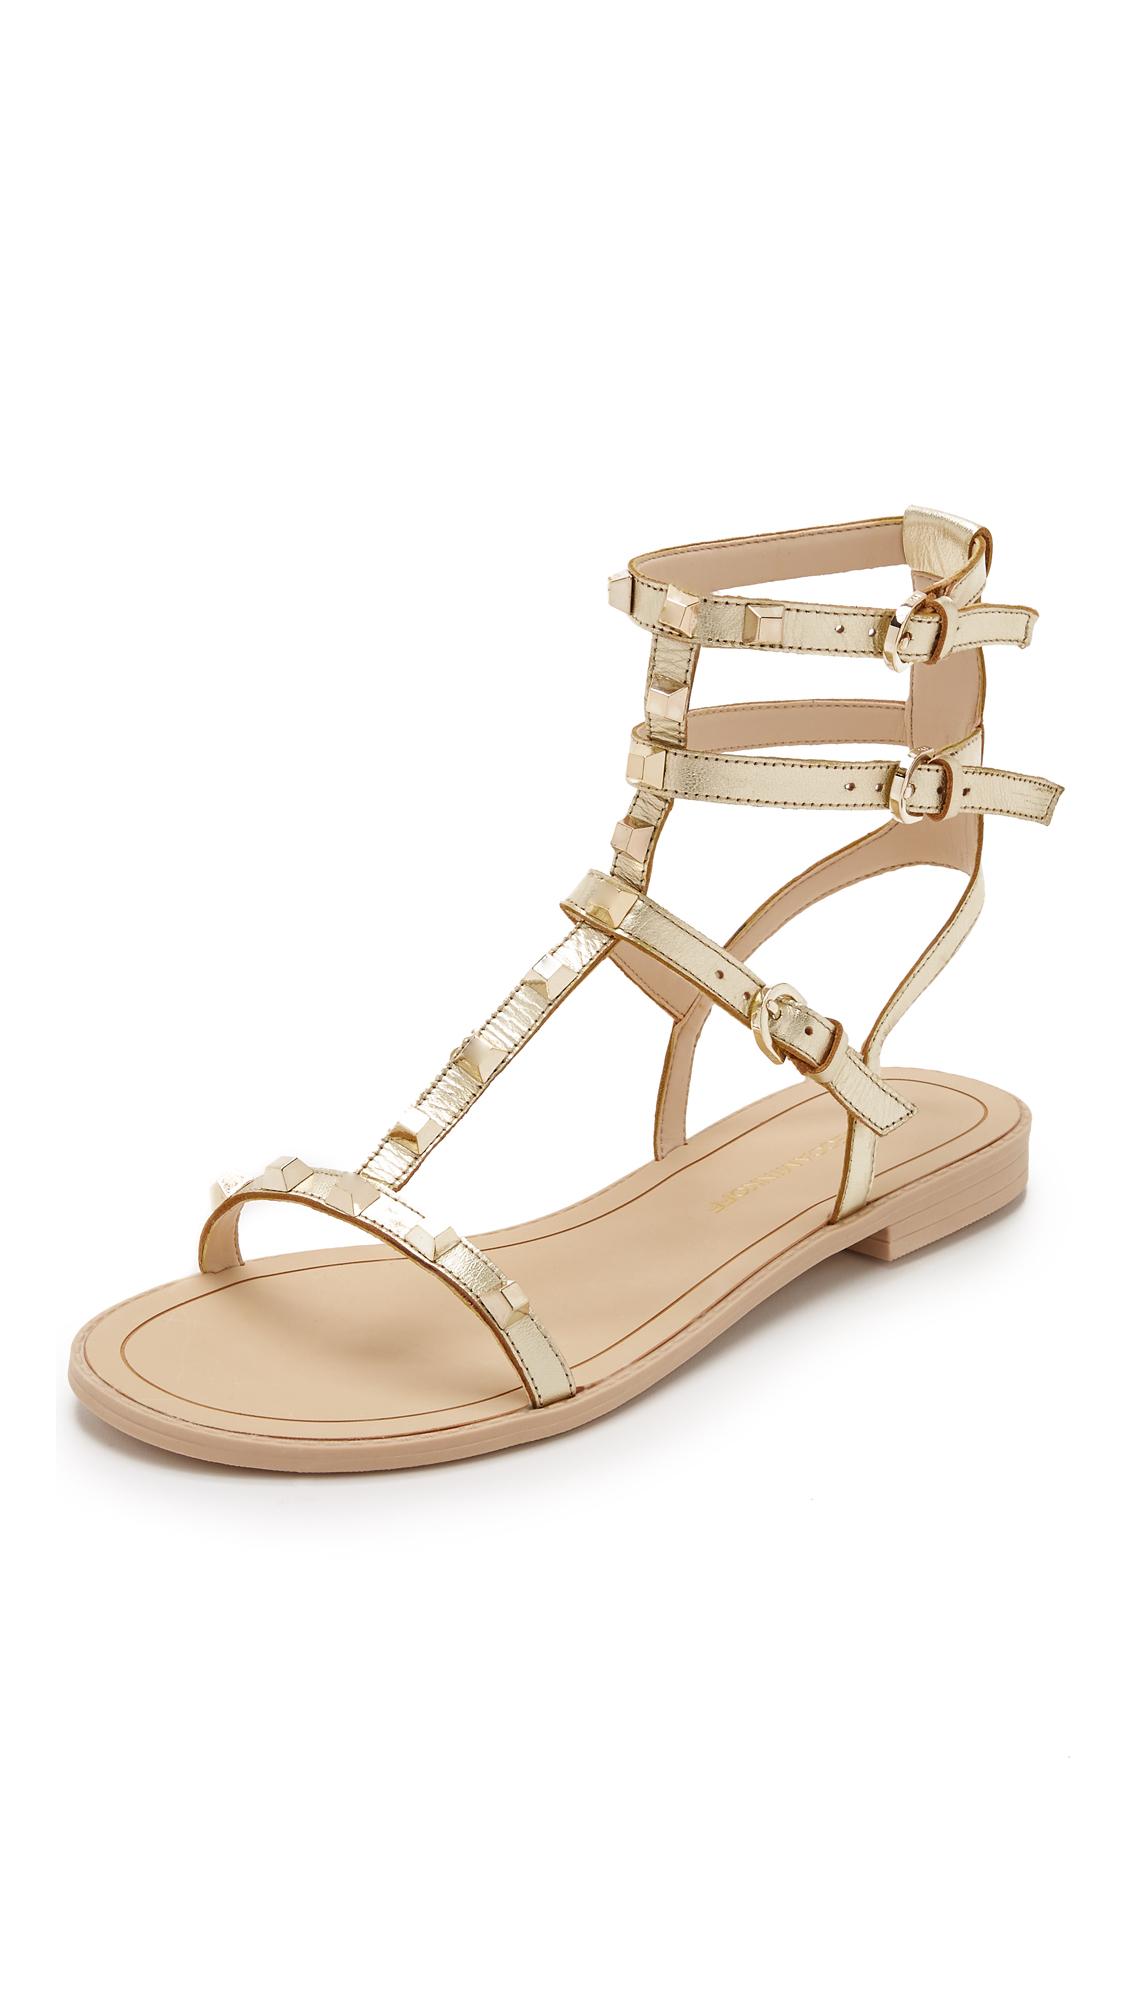 Lyst Rebecca Minkoff Georgina Studded Sandals In Metallic